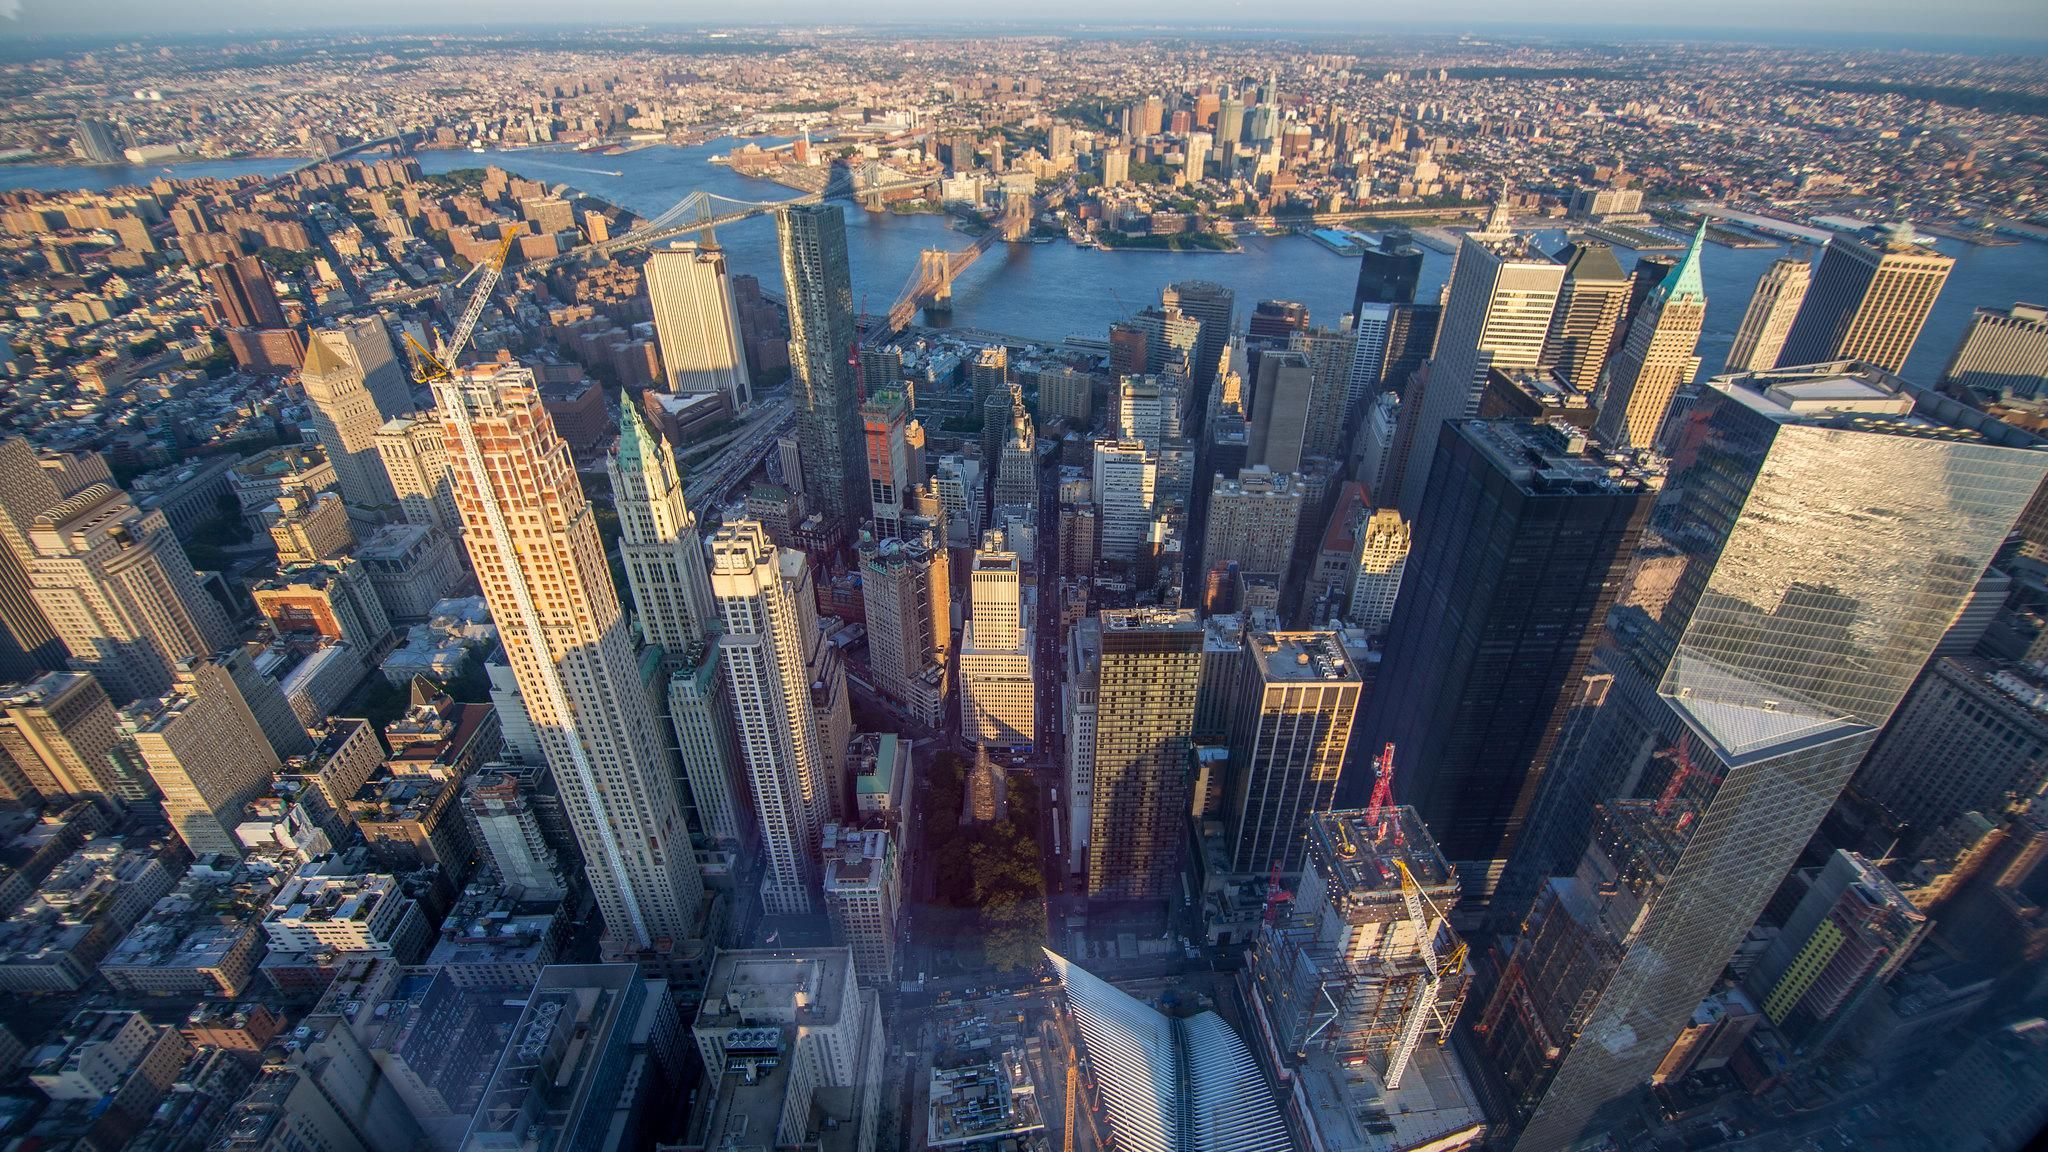 Pin On City Views